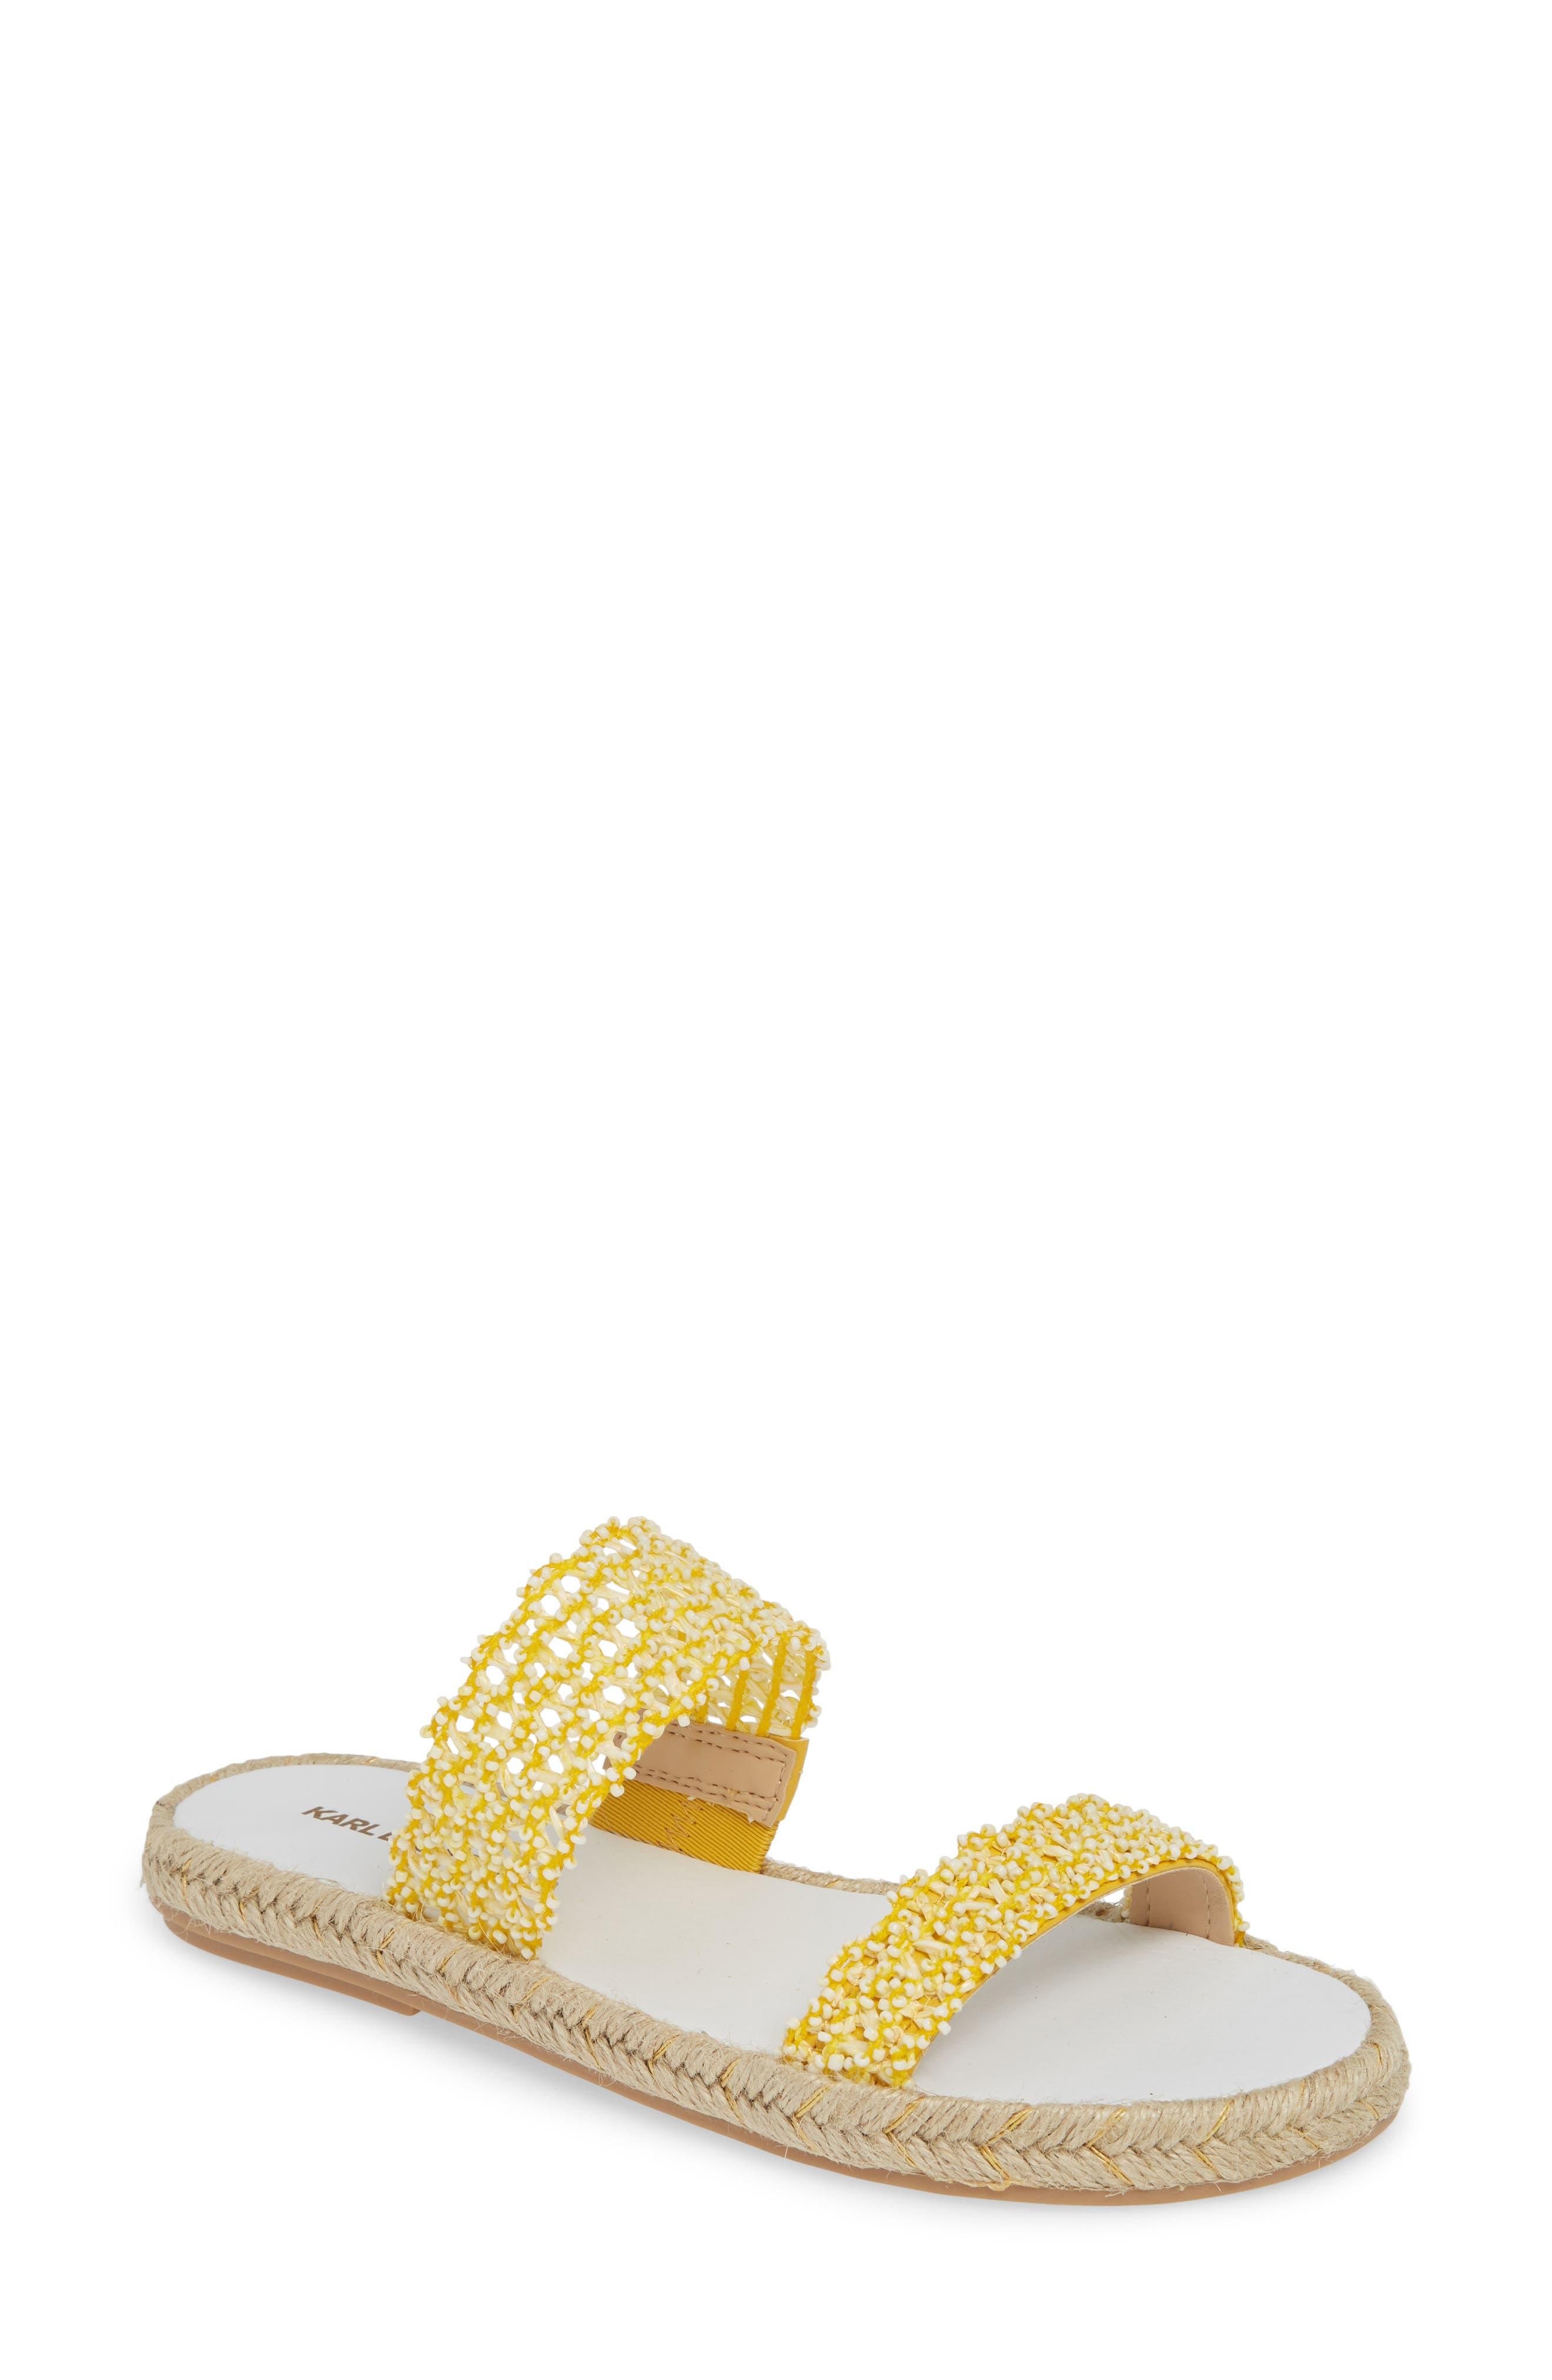 Karl Lagerfeld Paris Nita Slide Sandal, Yellow